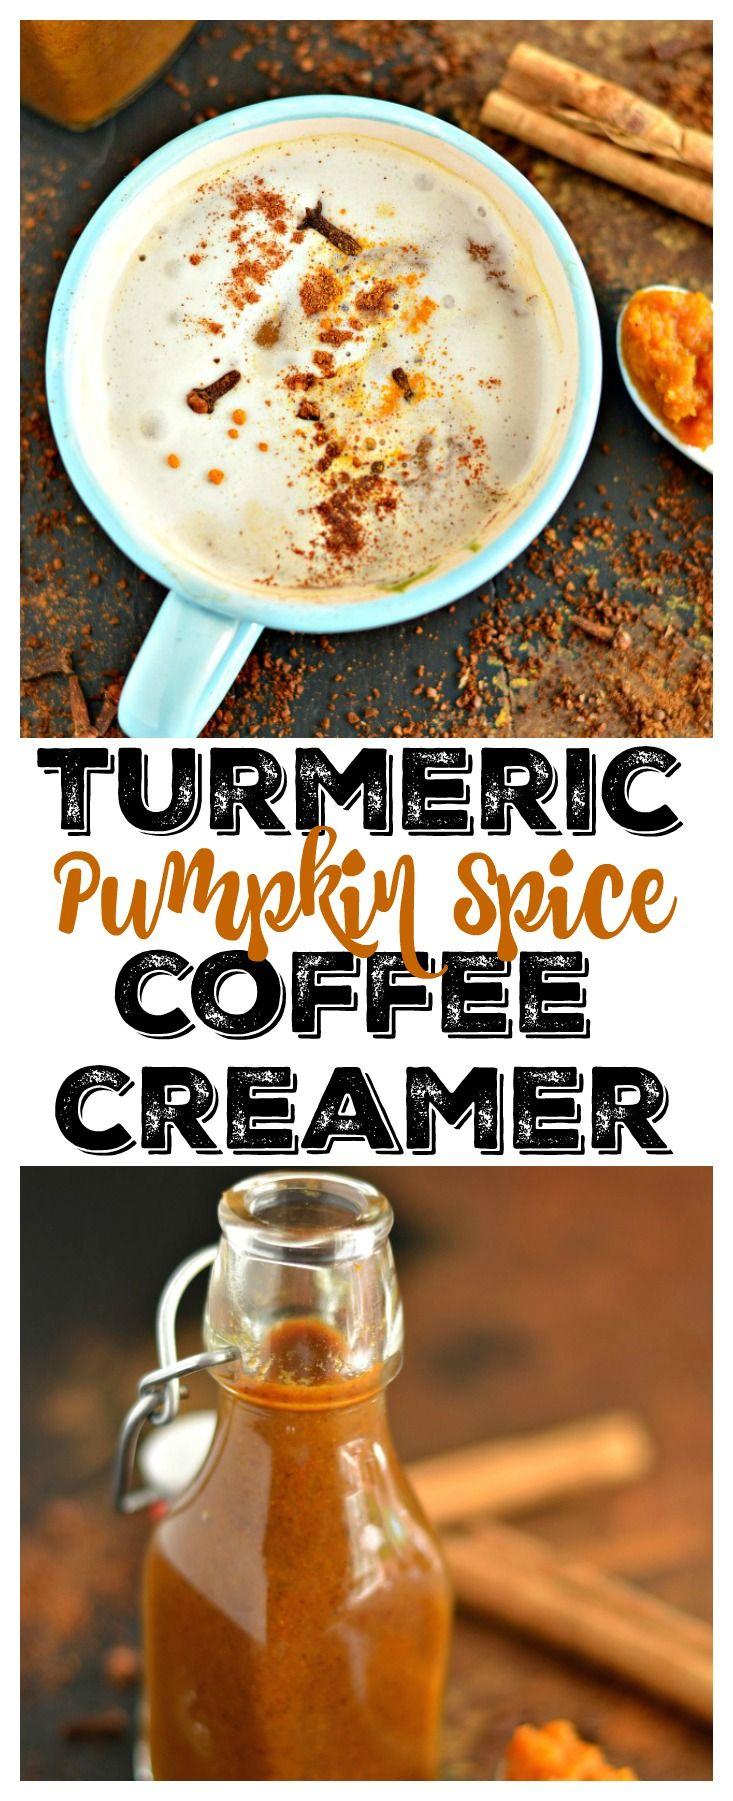 Homemade Turmeric Pumpkin Spice Coffee Syrup made with